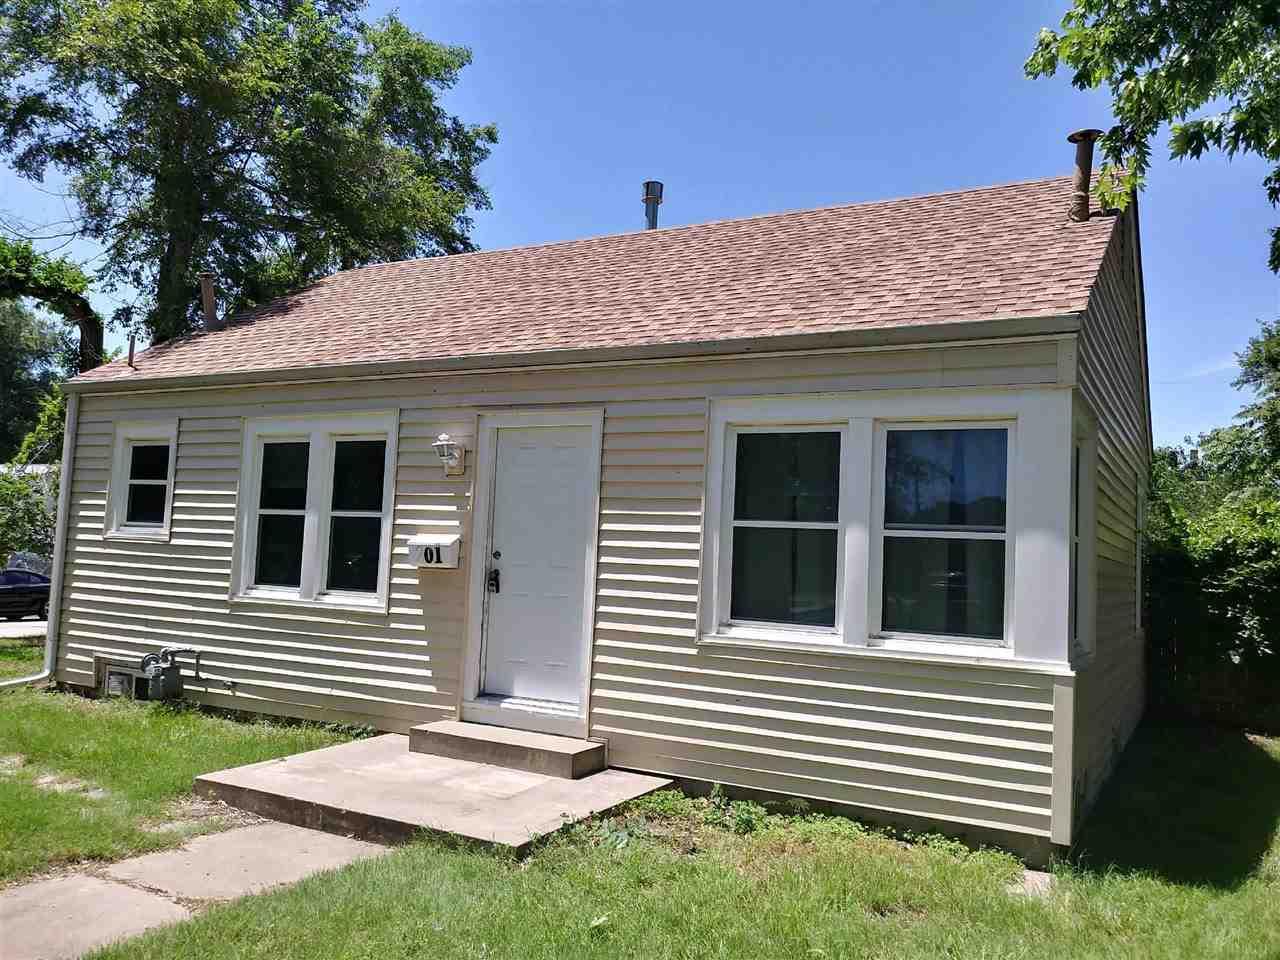 Corner Lot - House Vinyl Siding & Vinyl Windows - Utility Basement -  Detached Garage w/ opener - La